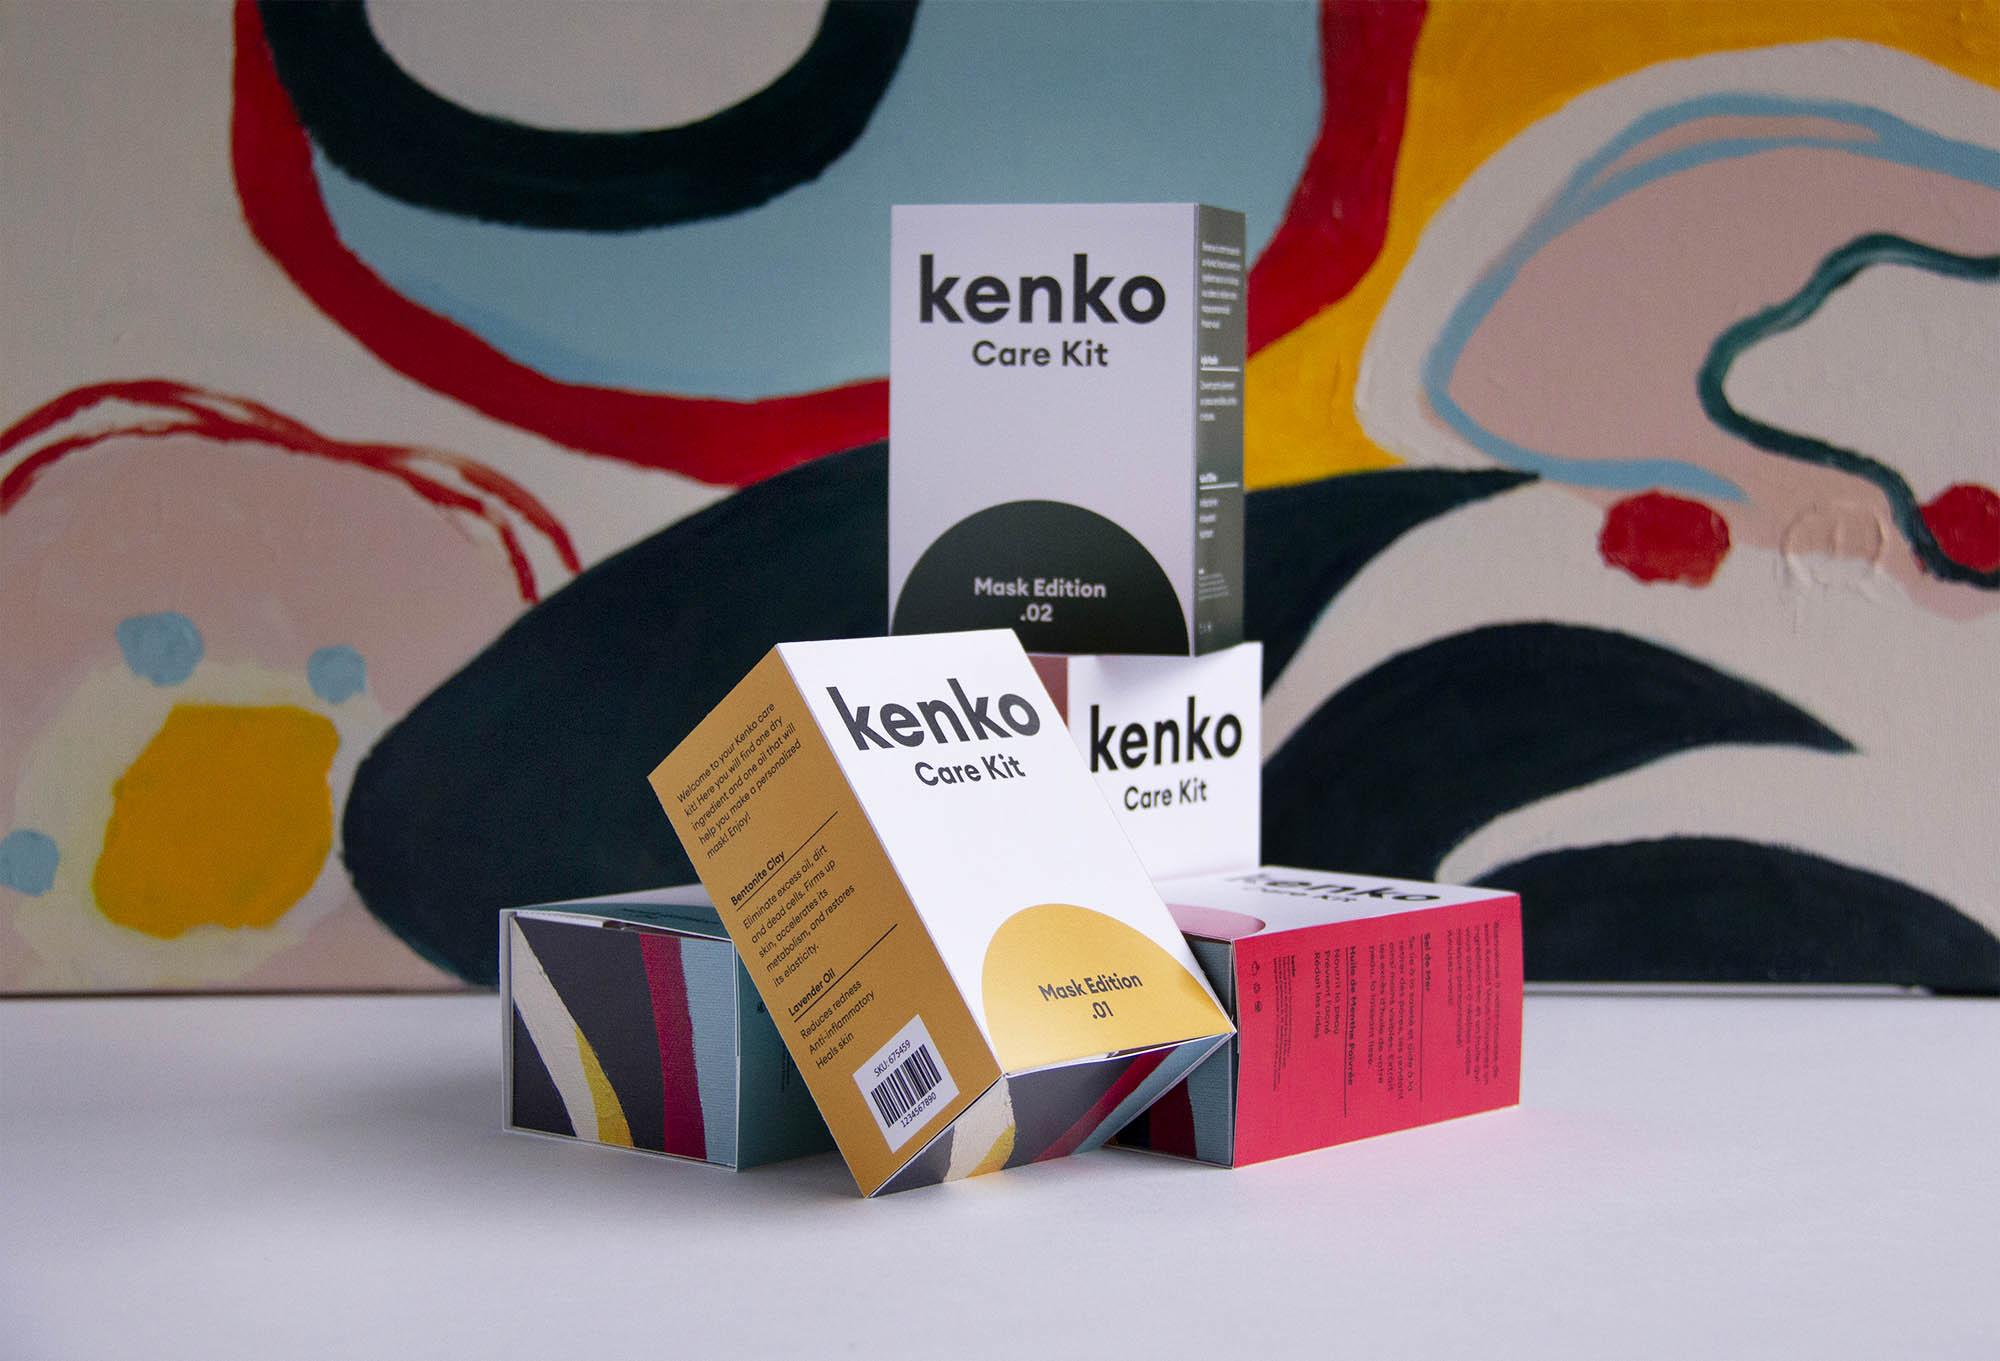 Kenko Box's